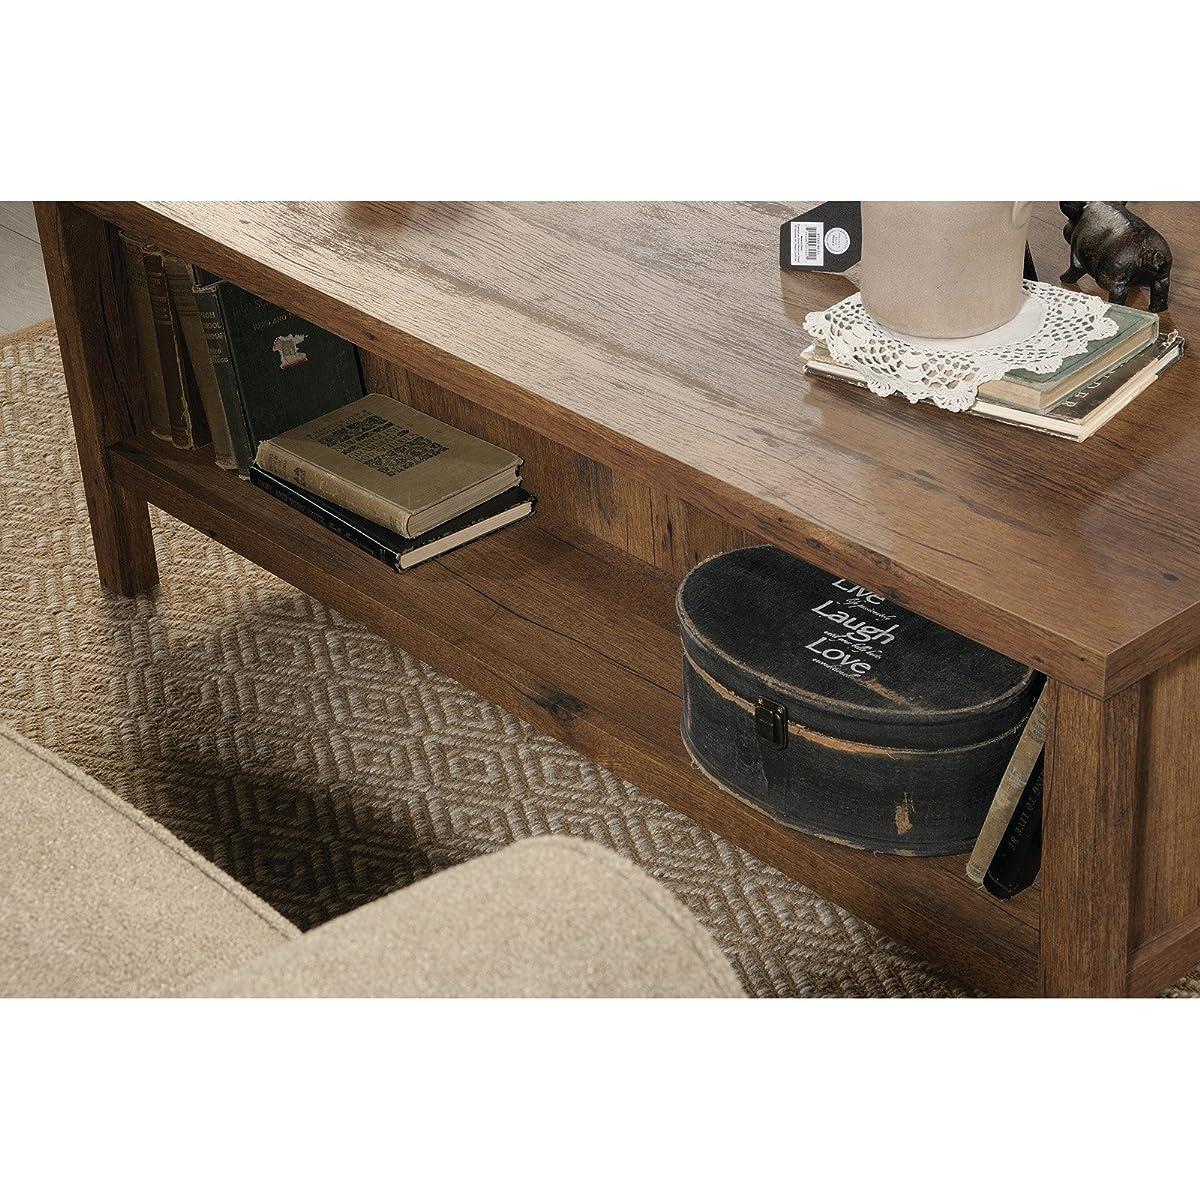 Sauder New Grange Storage Coffee Table in Vintage Oak